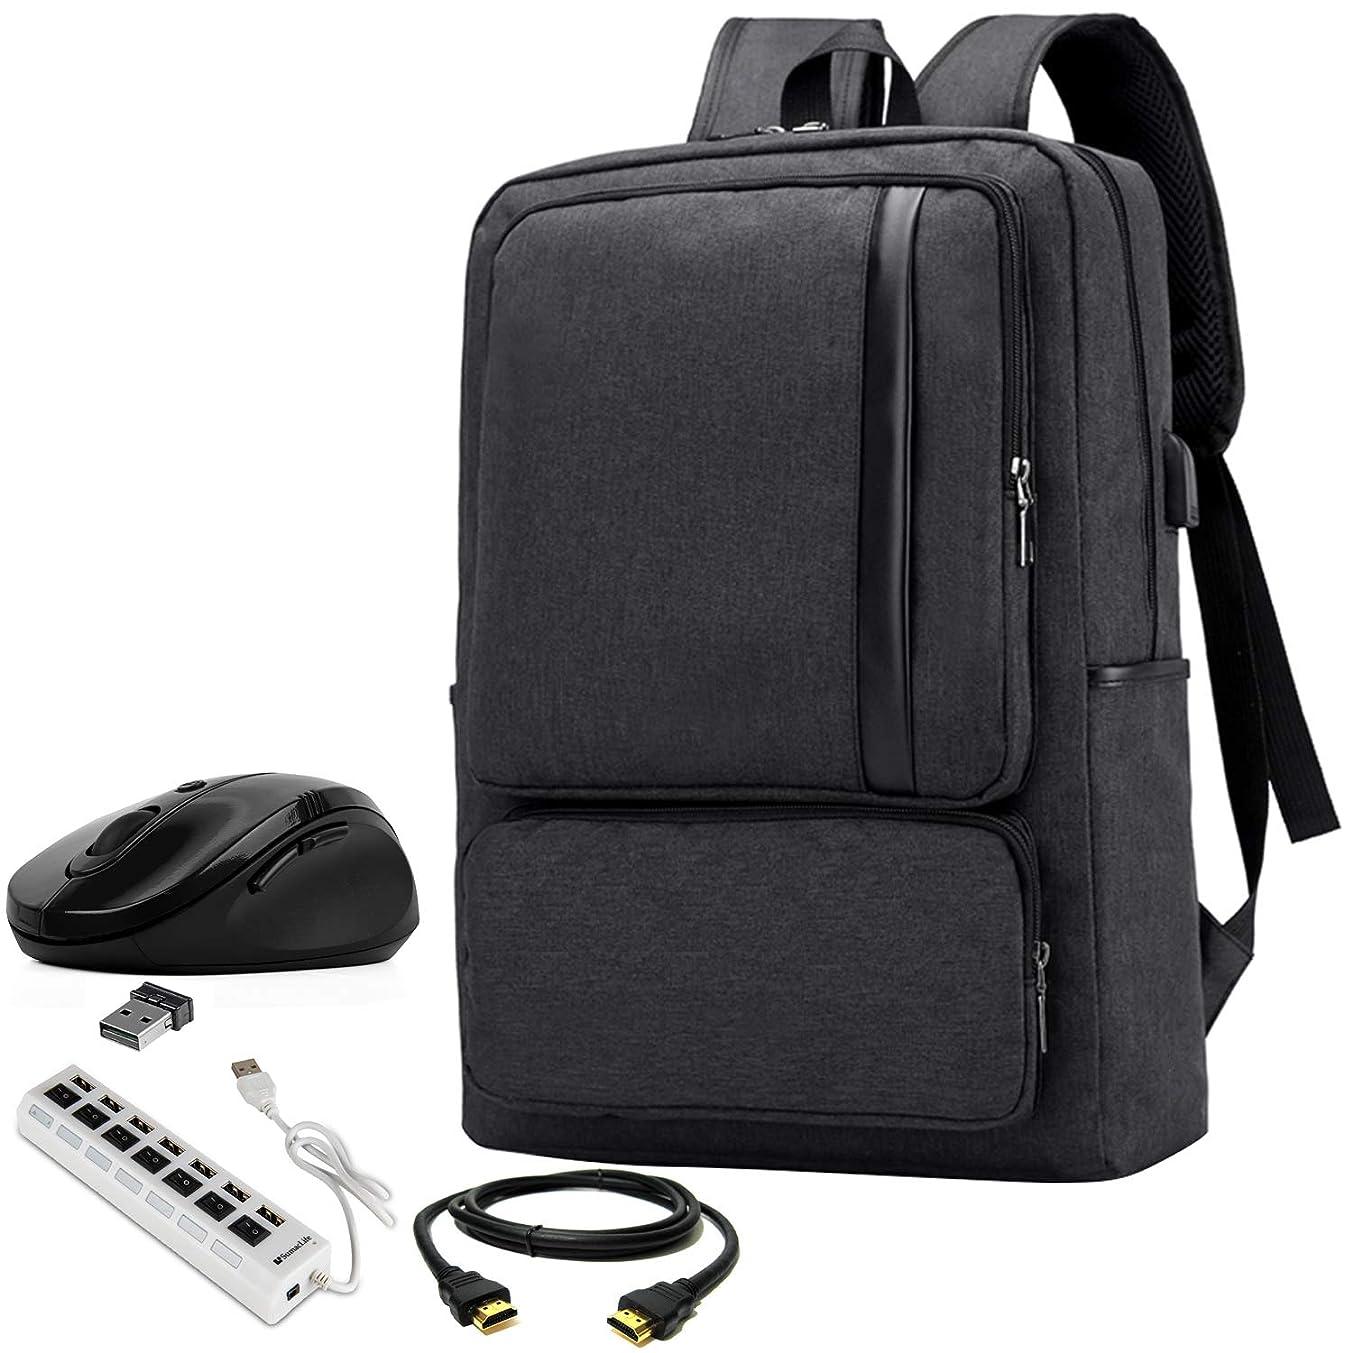 VG Bags Black 15.6-inch Slim Lightweight Laptop Backpack with USB Hub, Mouse, HDMI Cable for Lenovo Legion, ThinkPad, Yoga, IdeaPad, Flex, ChromeBook 14